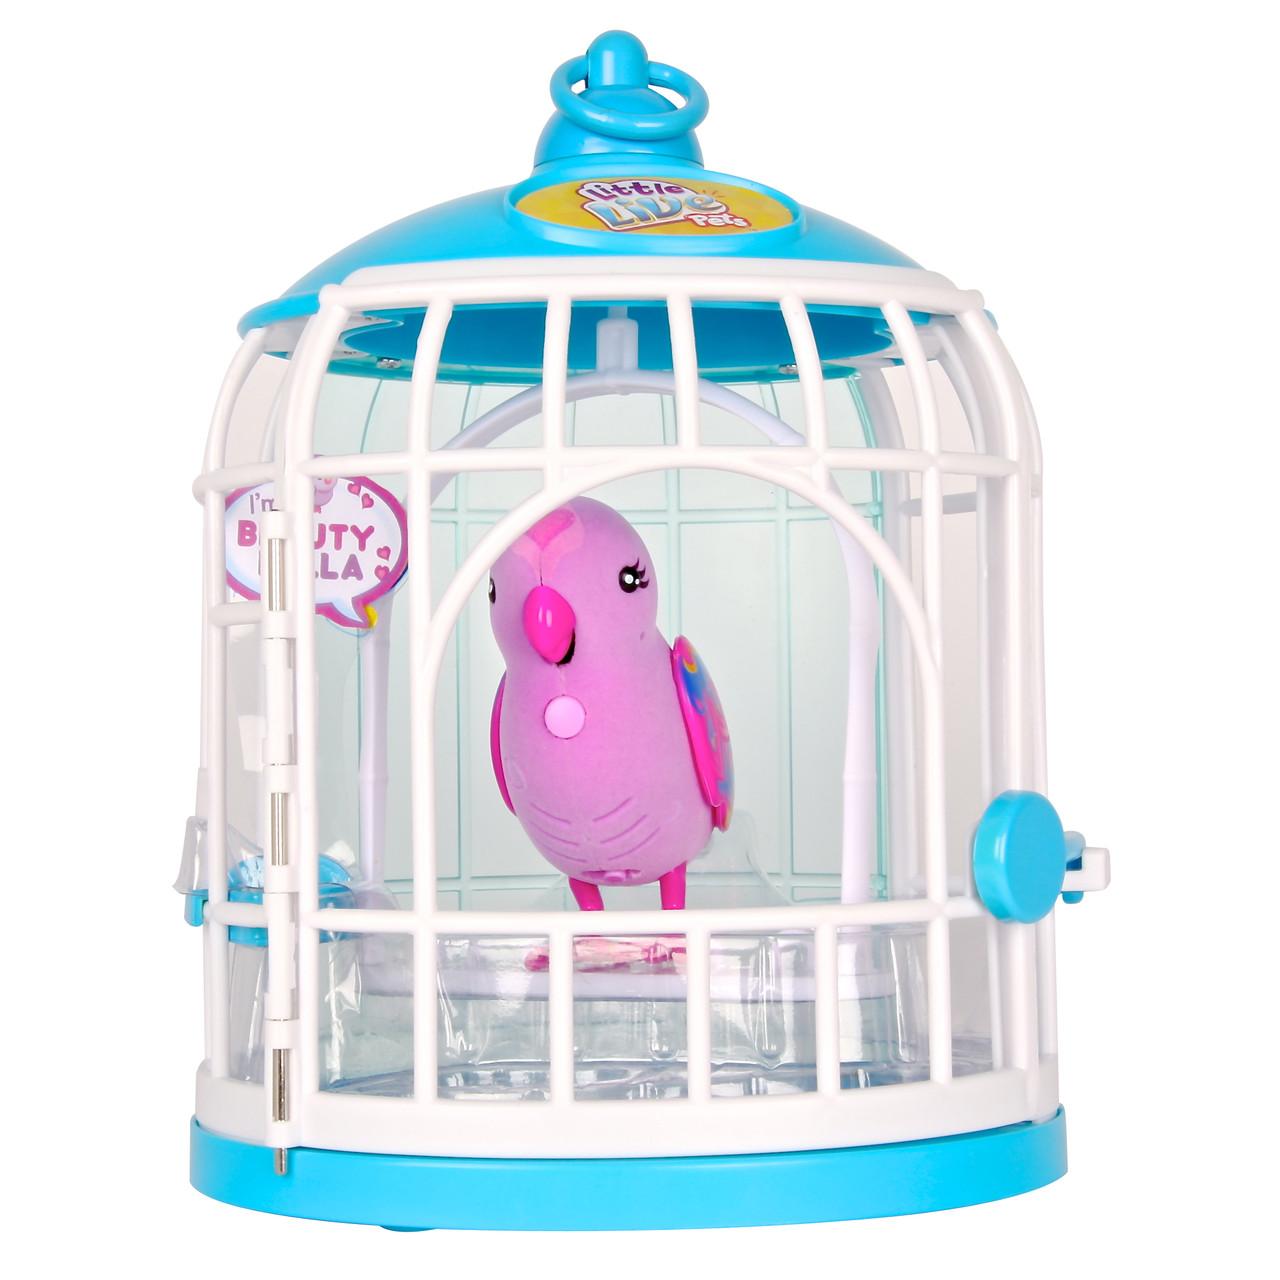 Интерактивная игрушка «Little Live Pets» (28024) птичка в клетке красотка Белла (Beauty Bella)